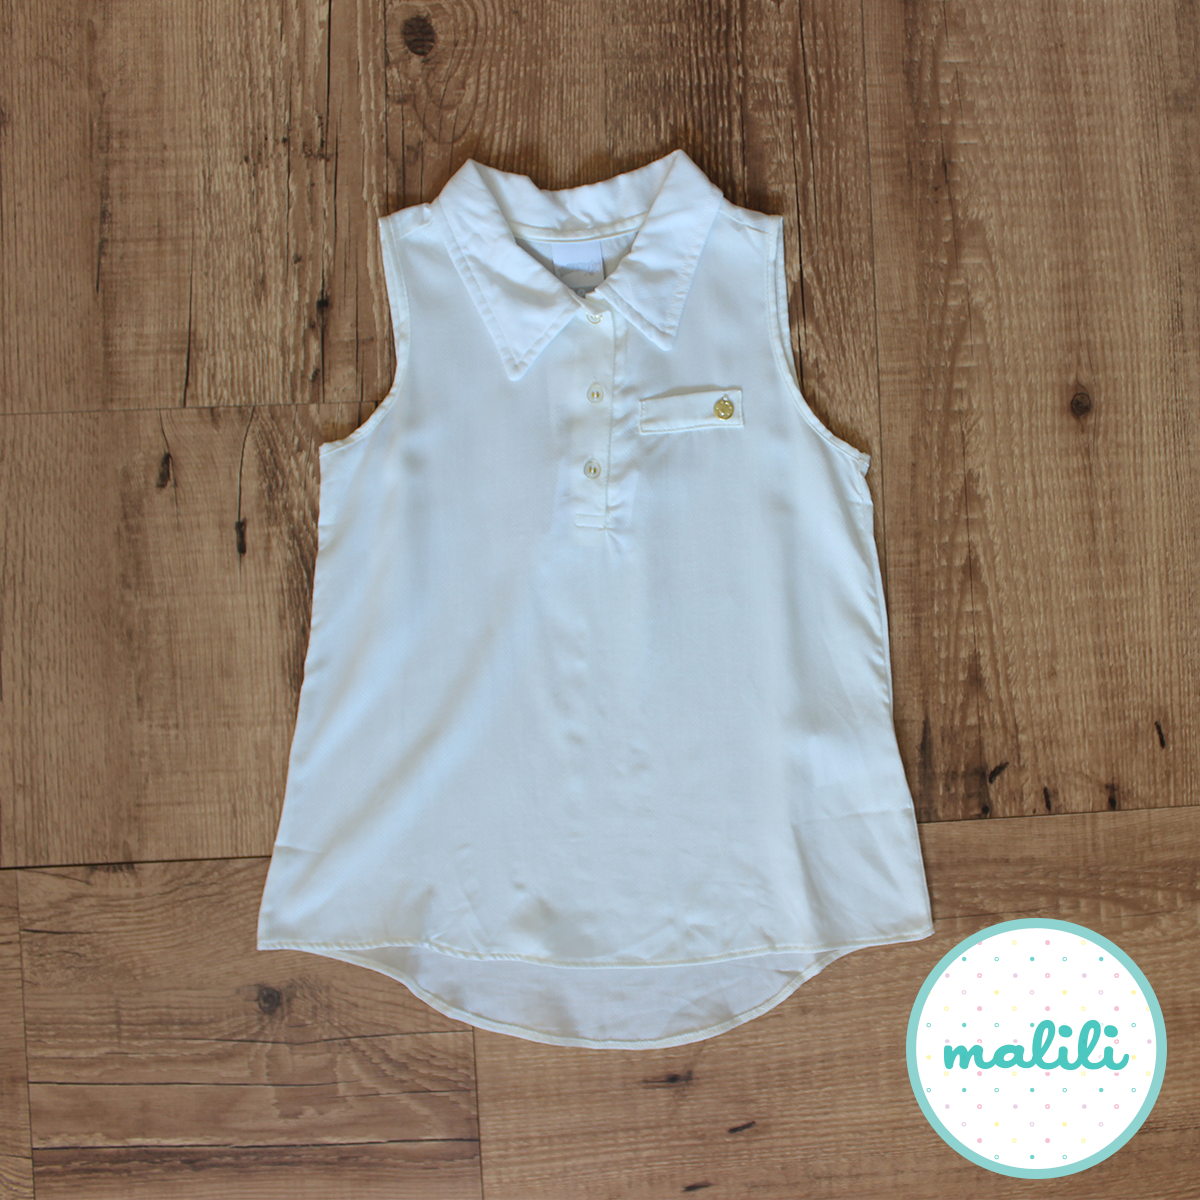 Blusa Branco (Código 43744) R$ 44,90